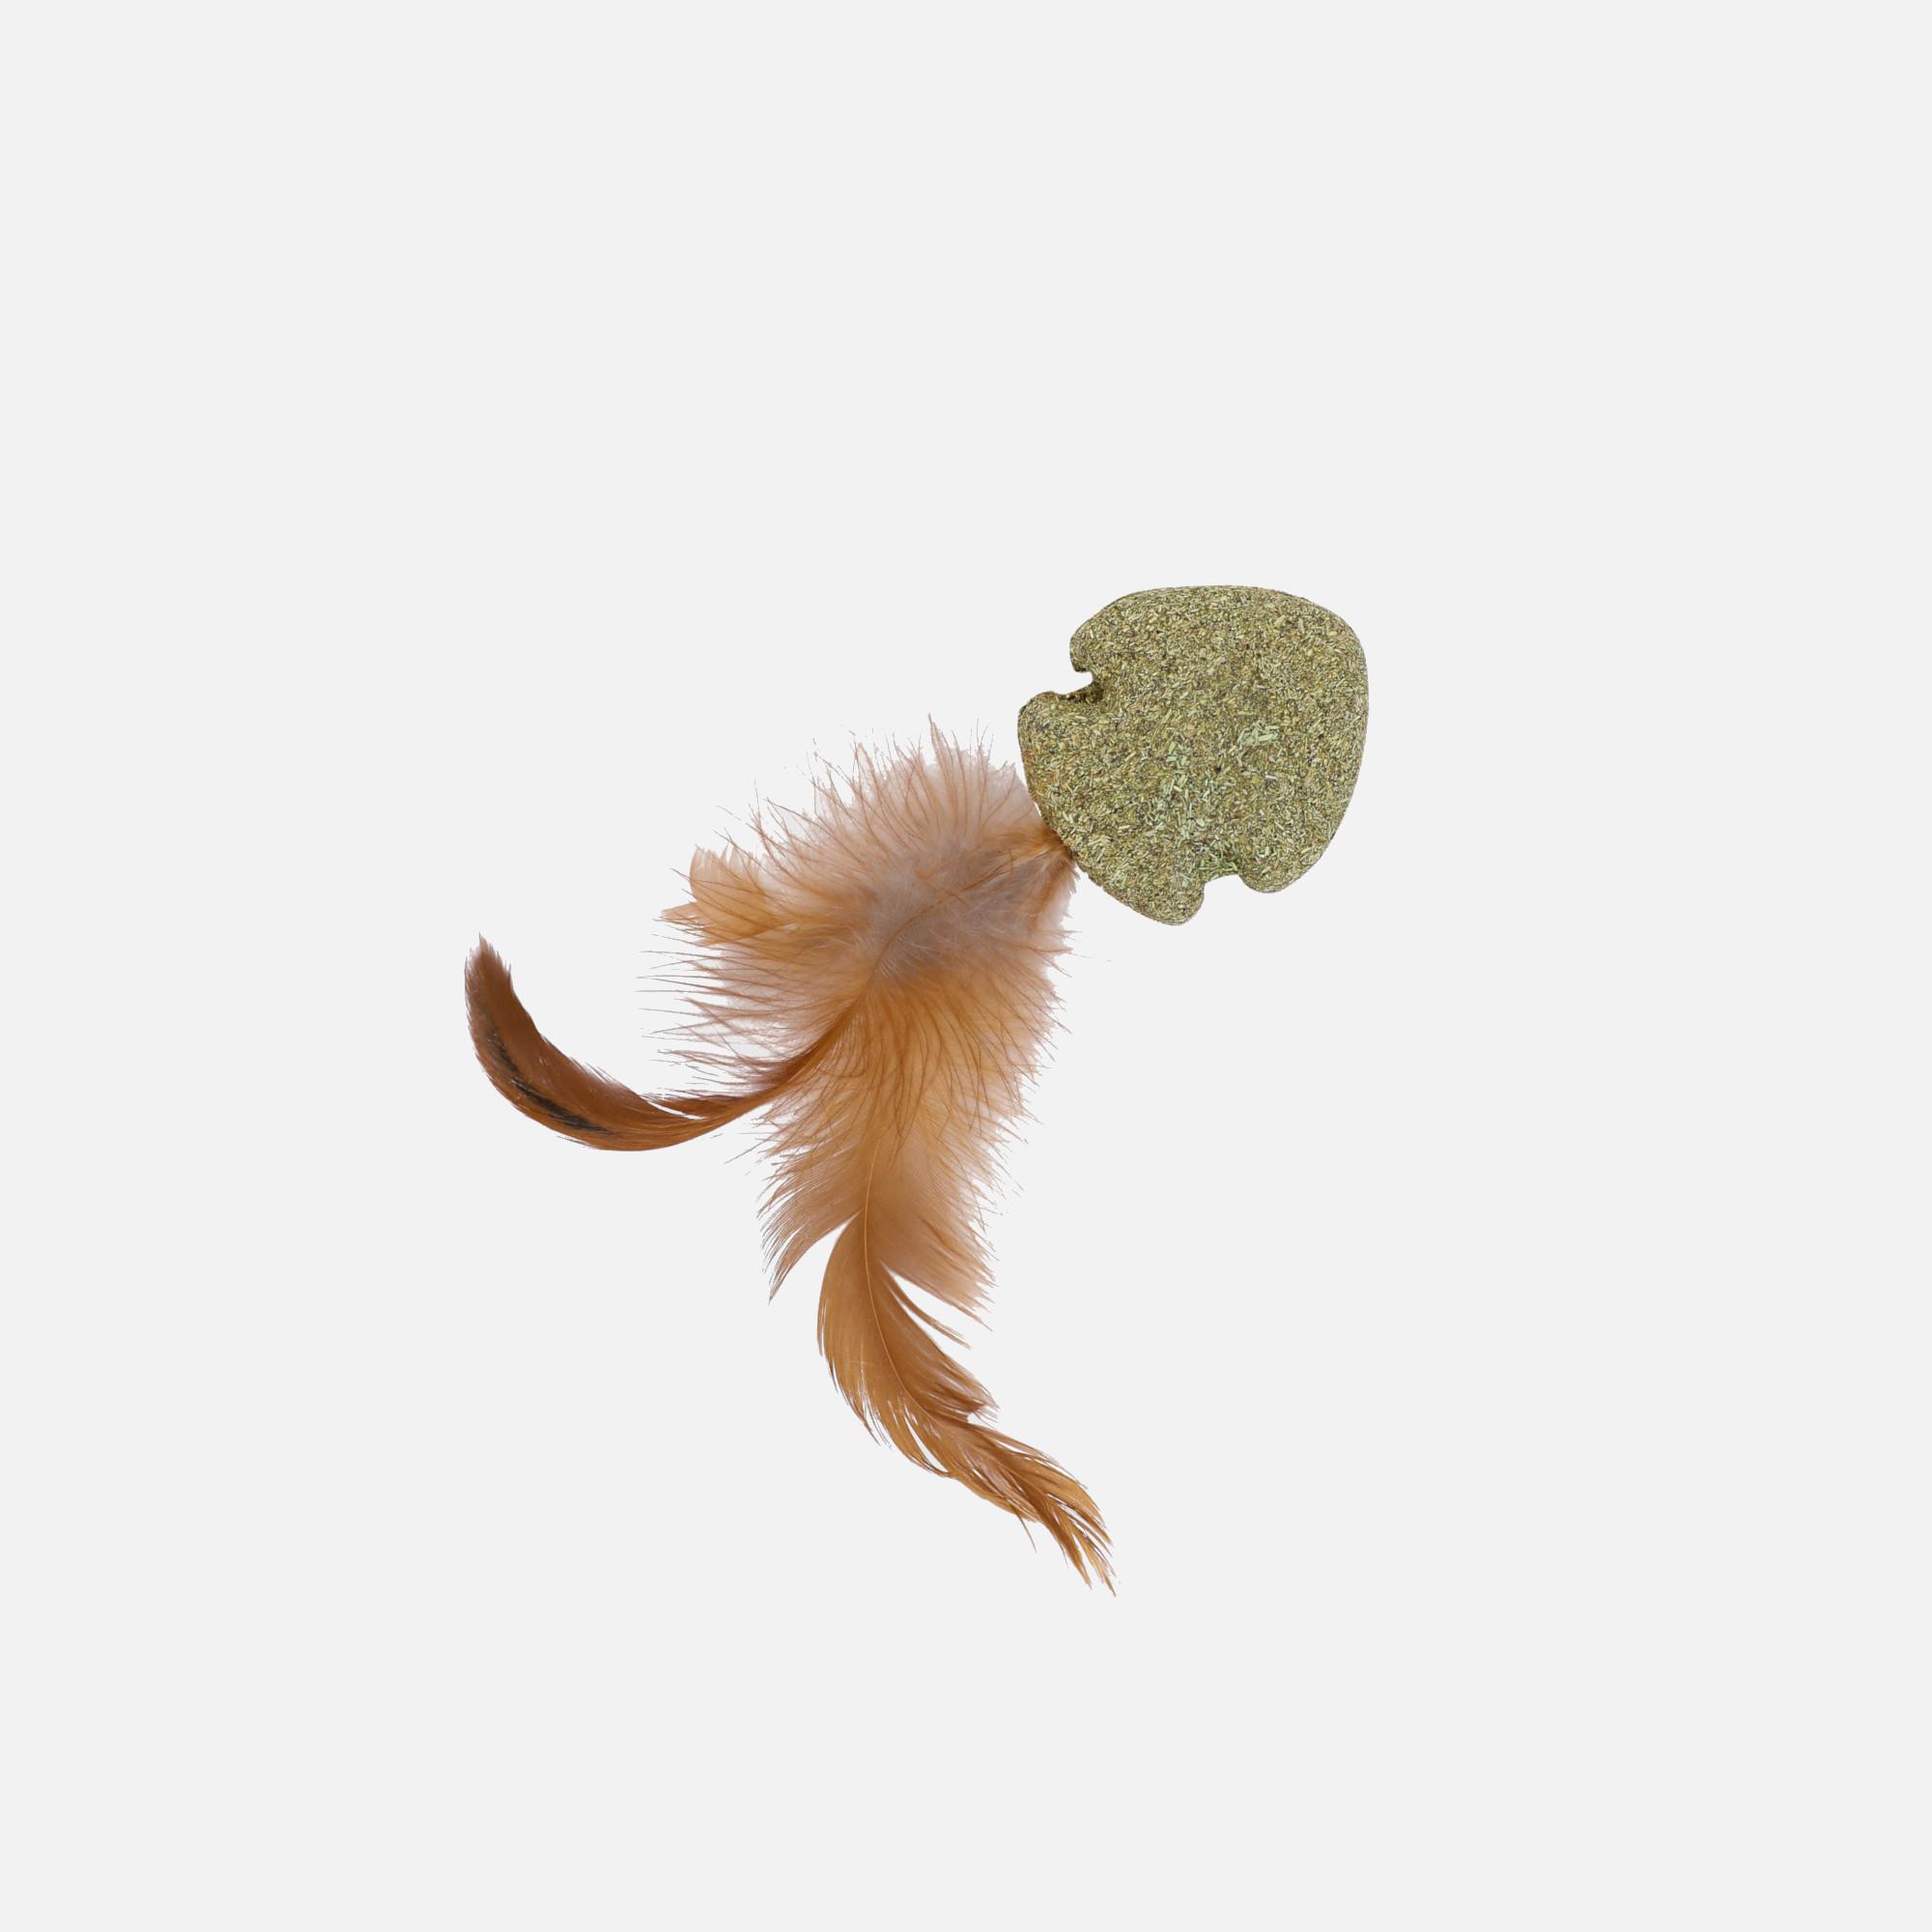 poisson_nageur_a_plumes matatabi naturel et herbe a chats